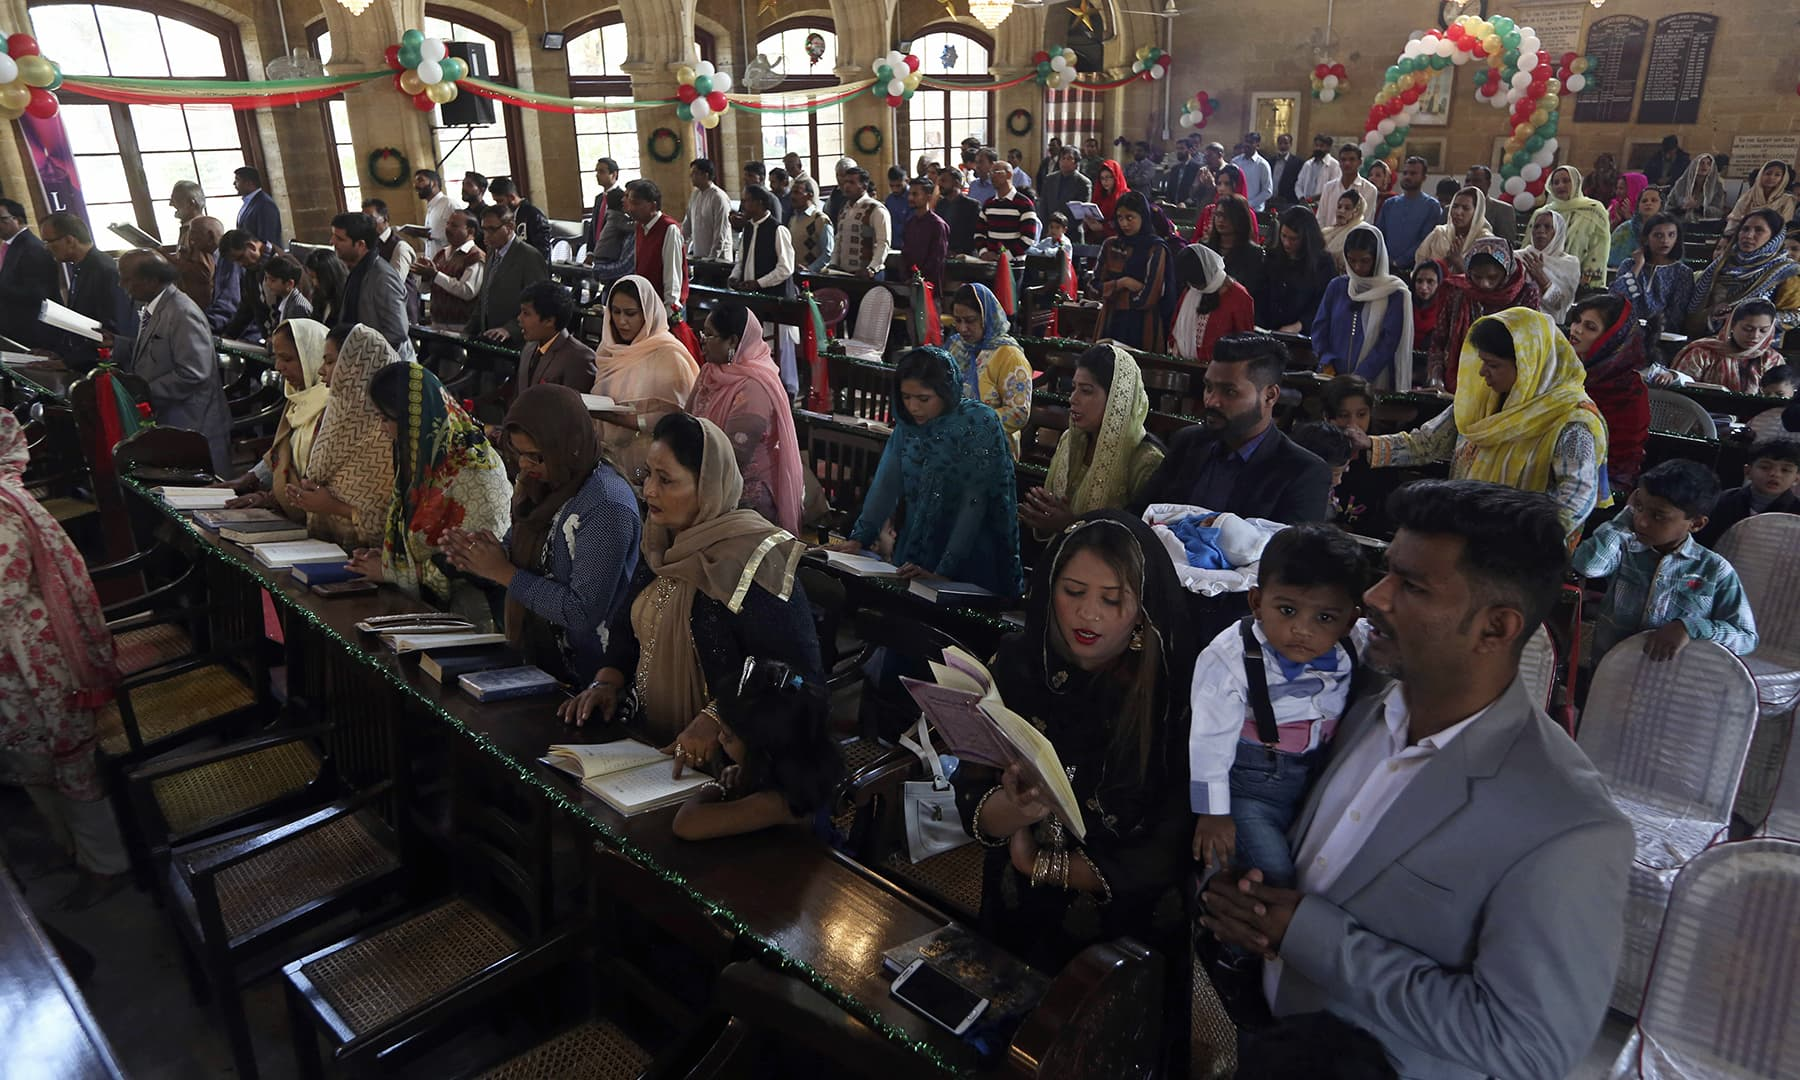 Christians attend Christmas Mass at a church in Karachi, Wednesday. — AP